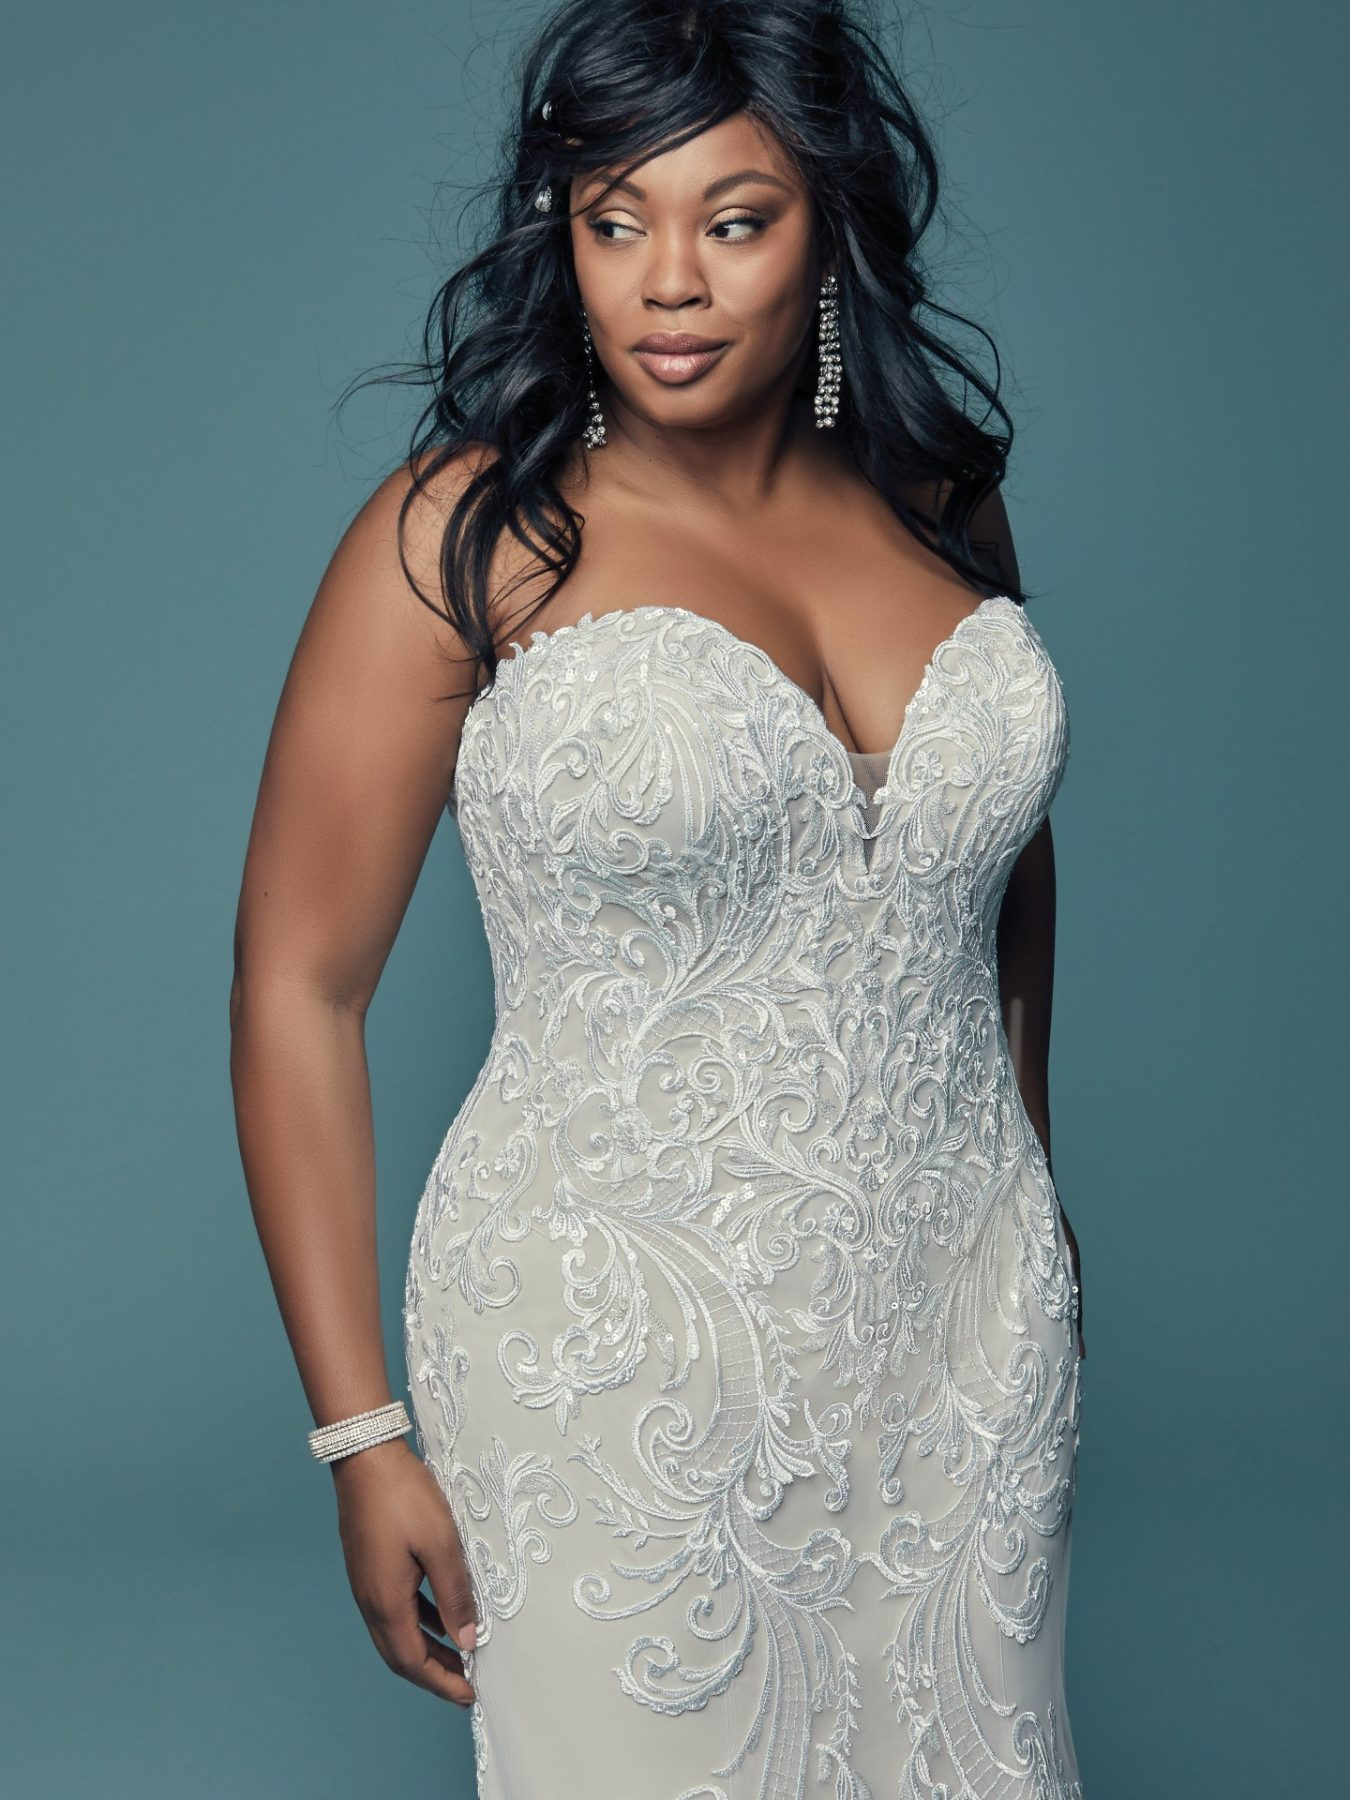 plus size wedding dress designers list off 18   medpharmres.com